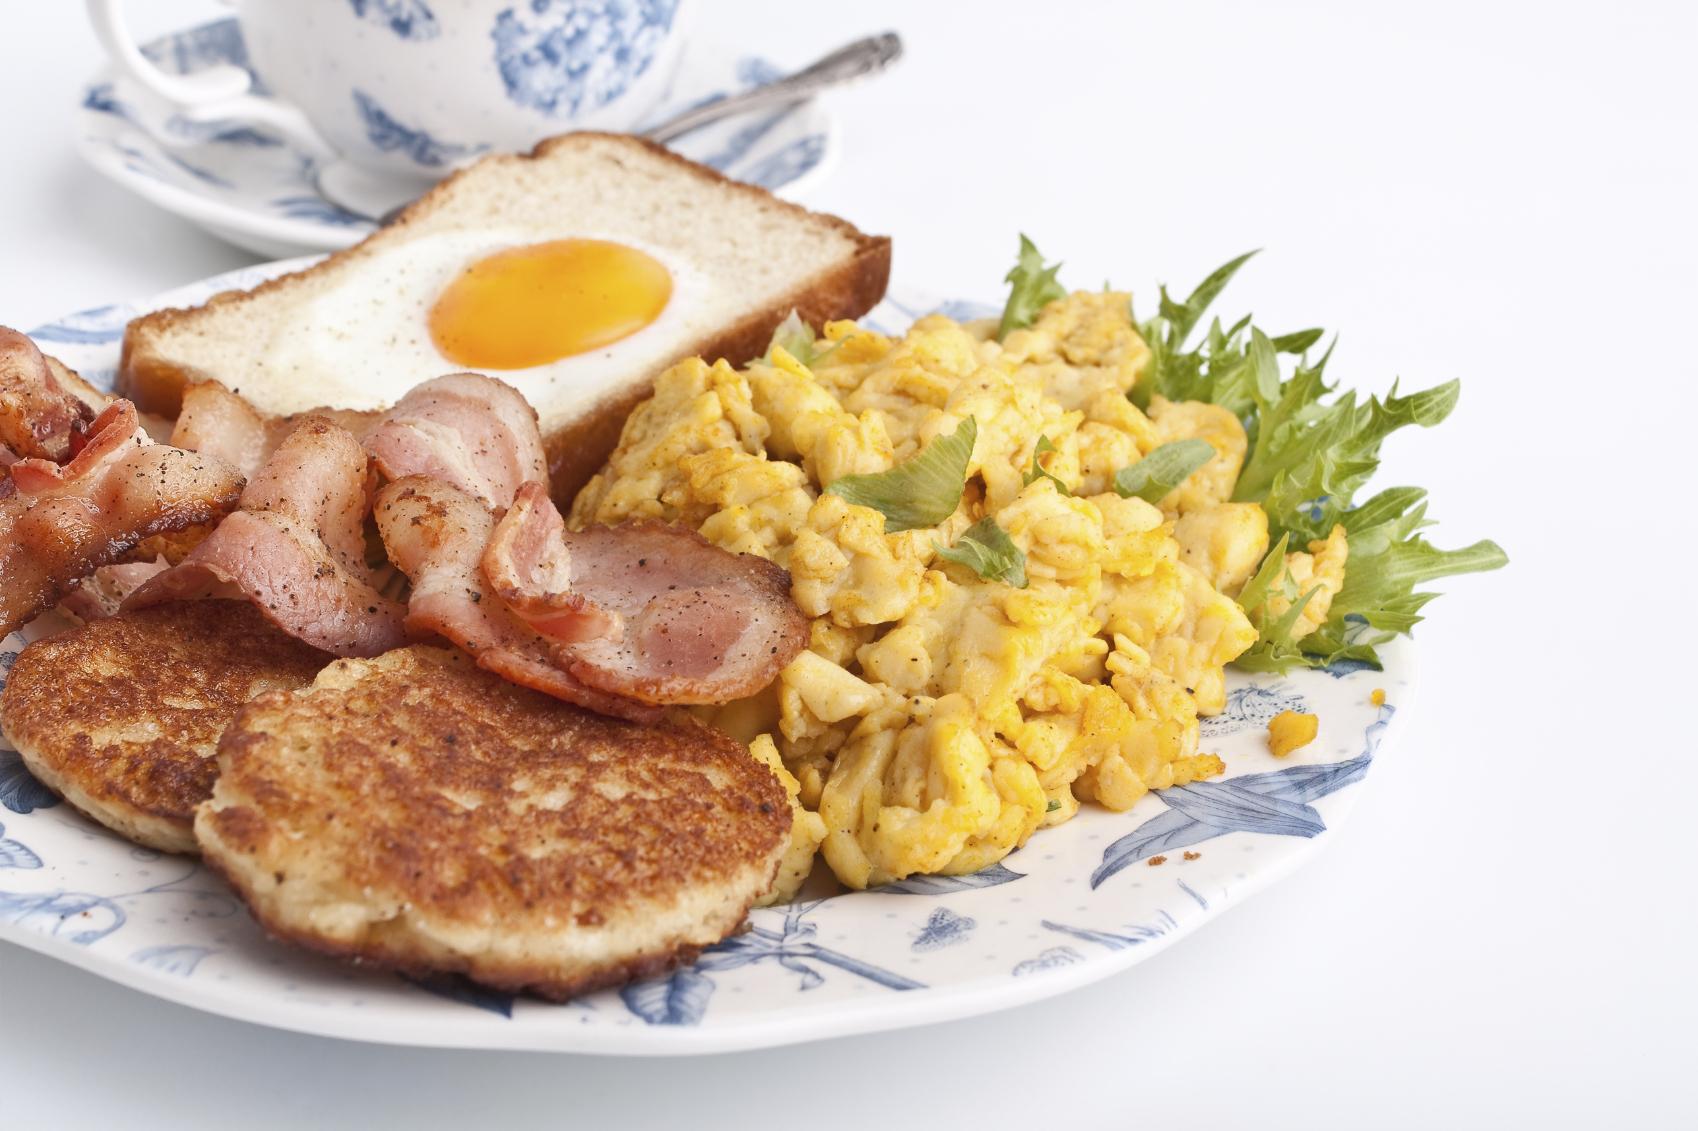 Egg, spinach and bacon brunch: Brunch għal tard filgħodu: ħbejża bil-bajd, spinaċi u bacon